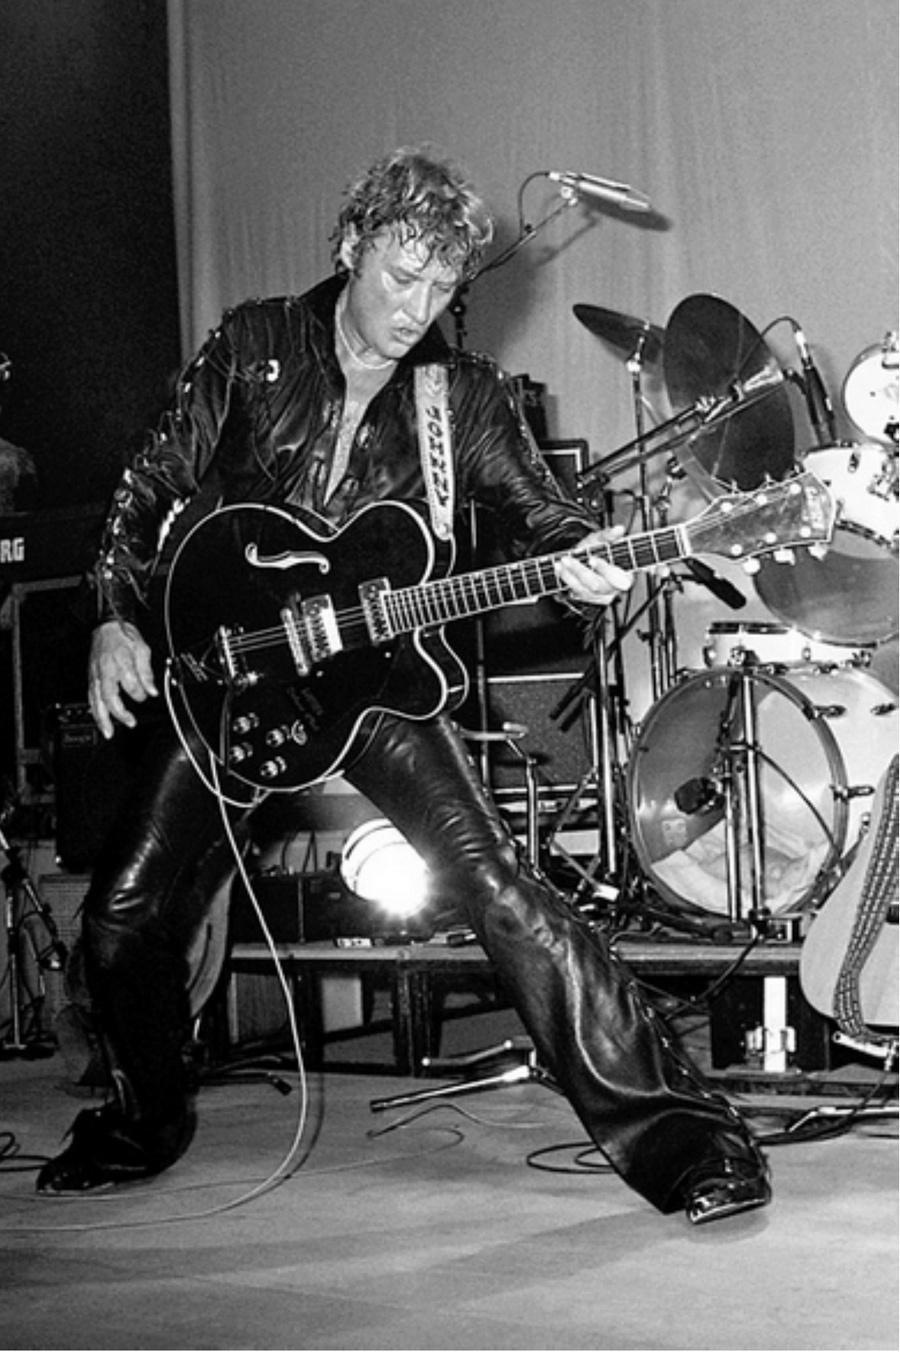 LES CONCERTS DE JOHNNY 'TOURNEE NIGHT RIDER BAND TOUR 1981' Captu893